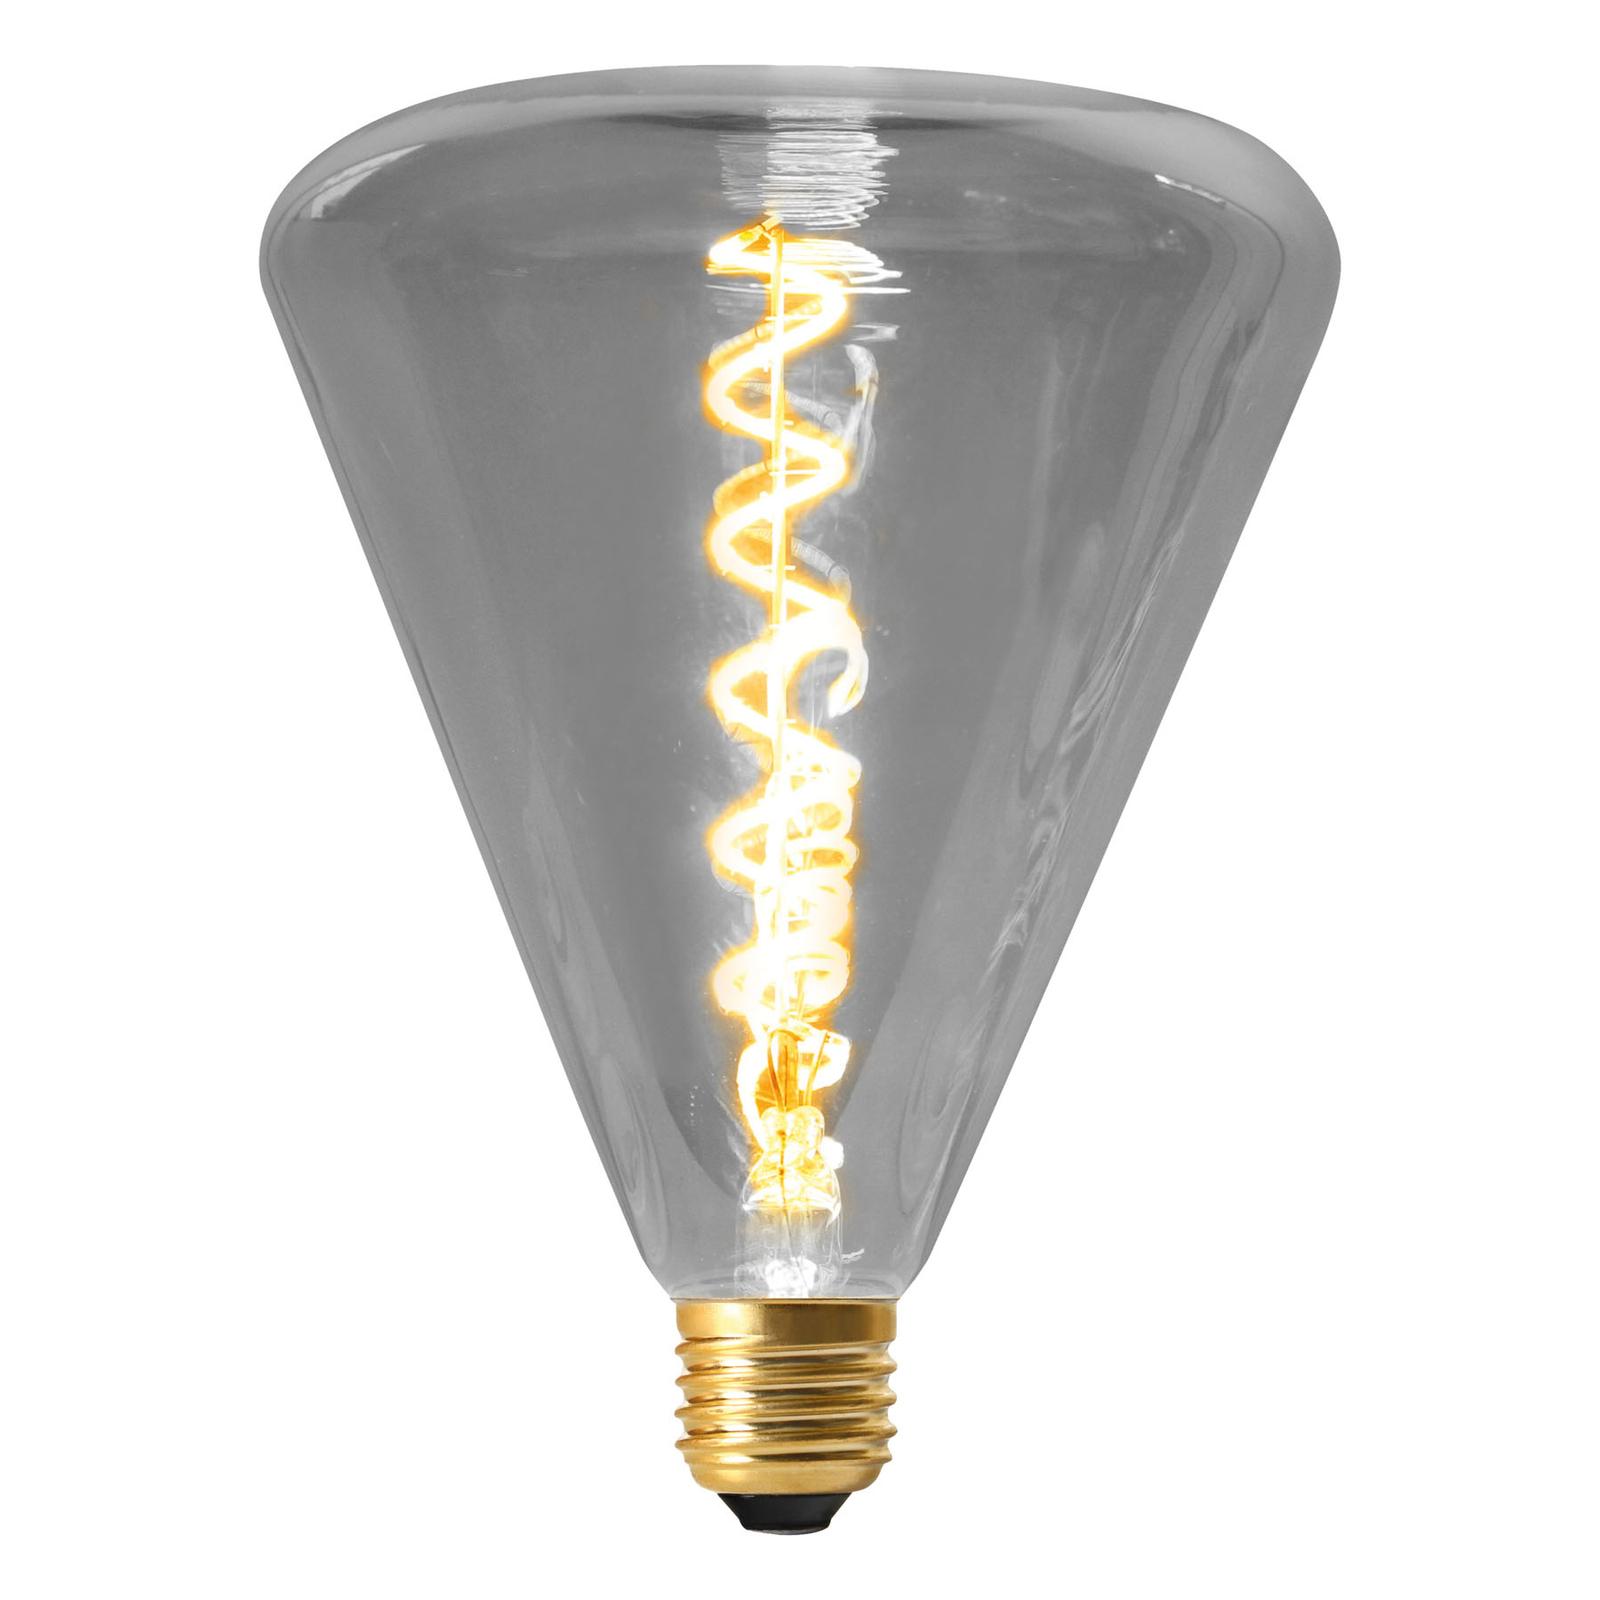 LED-pære Dilly E27 4 W 2200 K dimbare, grå